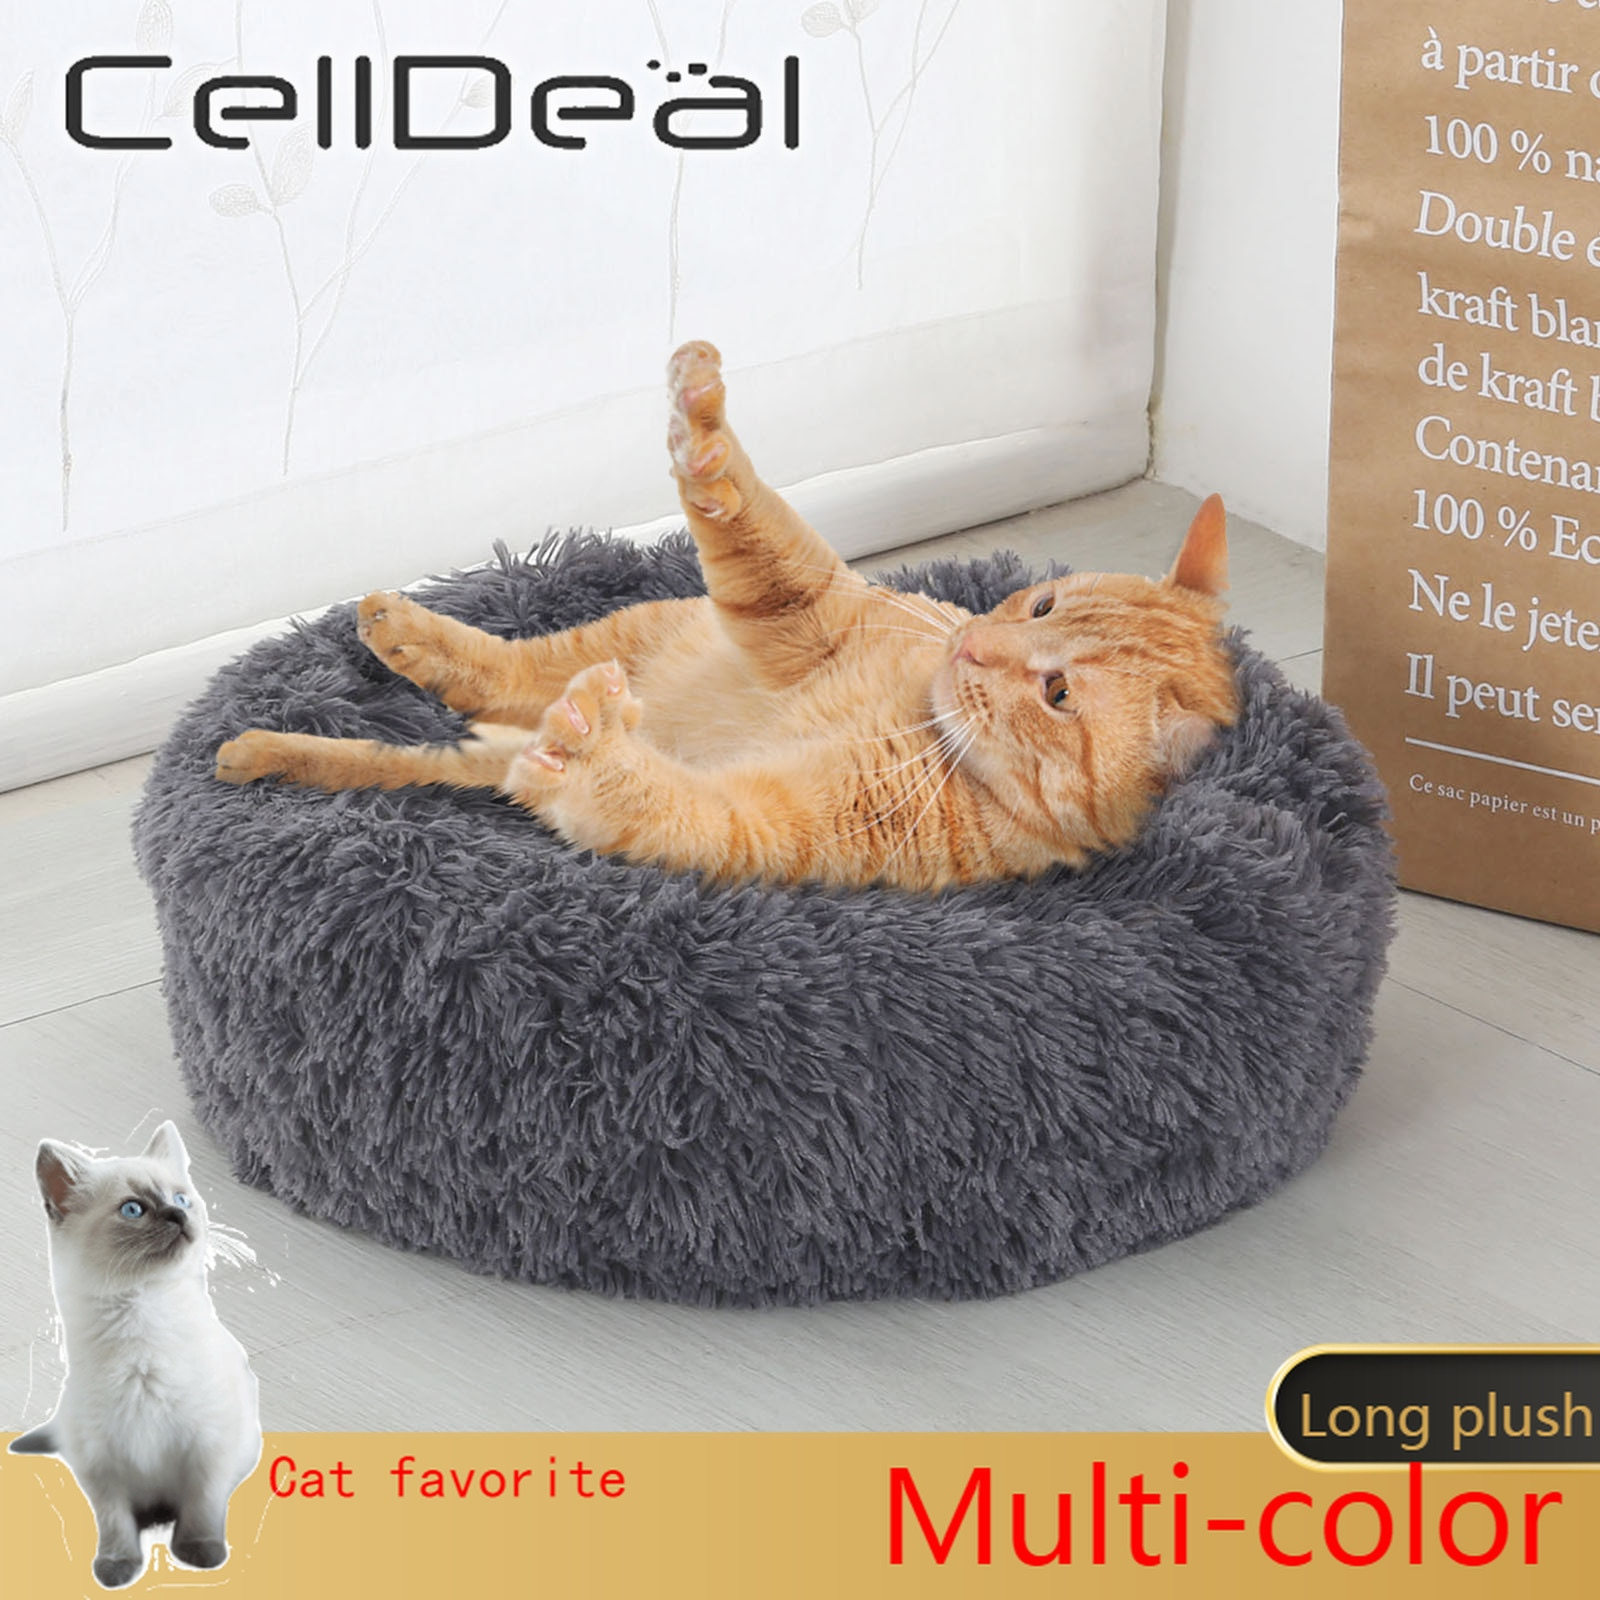 Cama de Gato supersuave, 14 colores, redonda, mullidas de gato, cesta para...